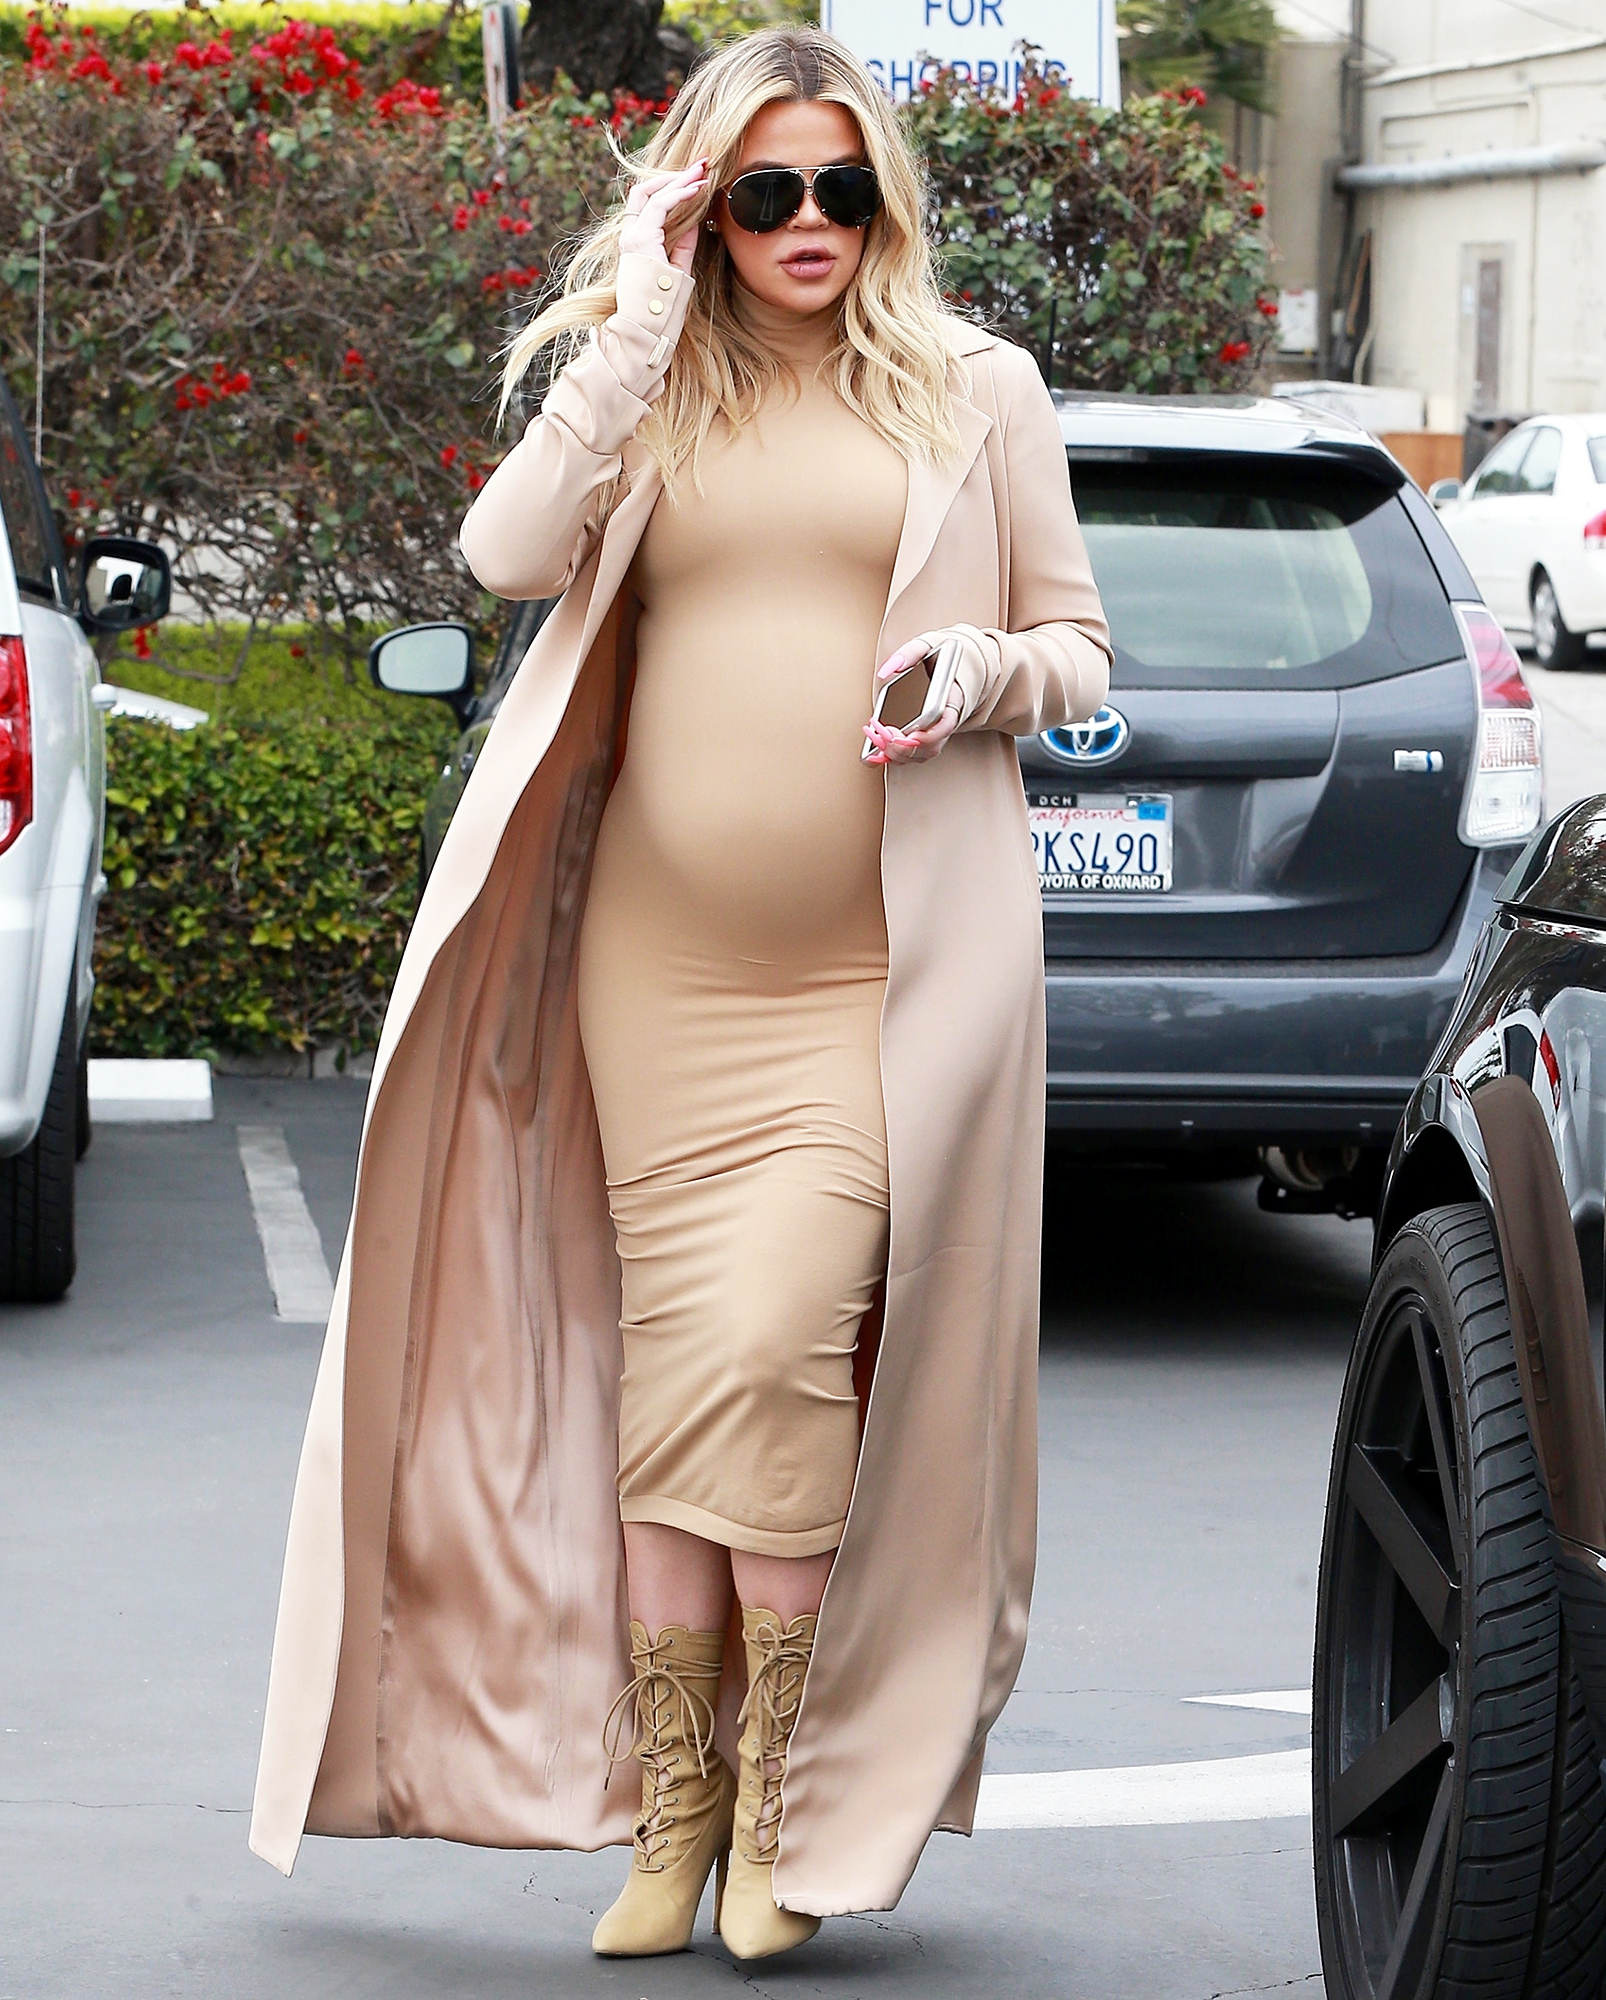 Khloe Kardashian Stress Cheating Scandal